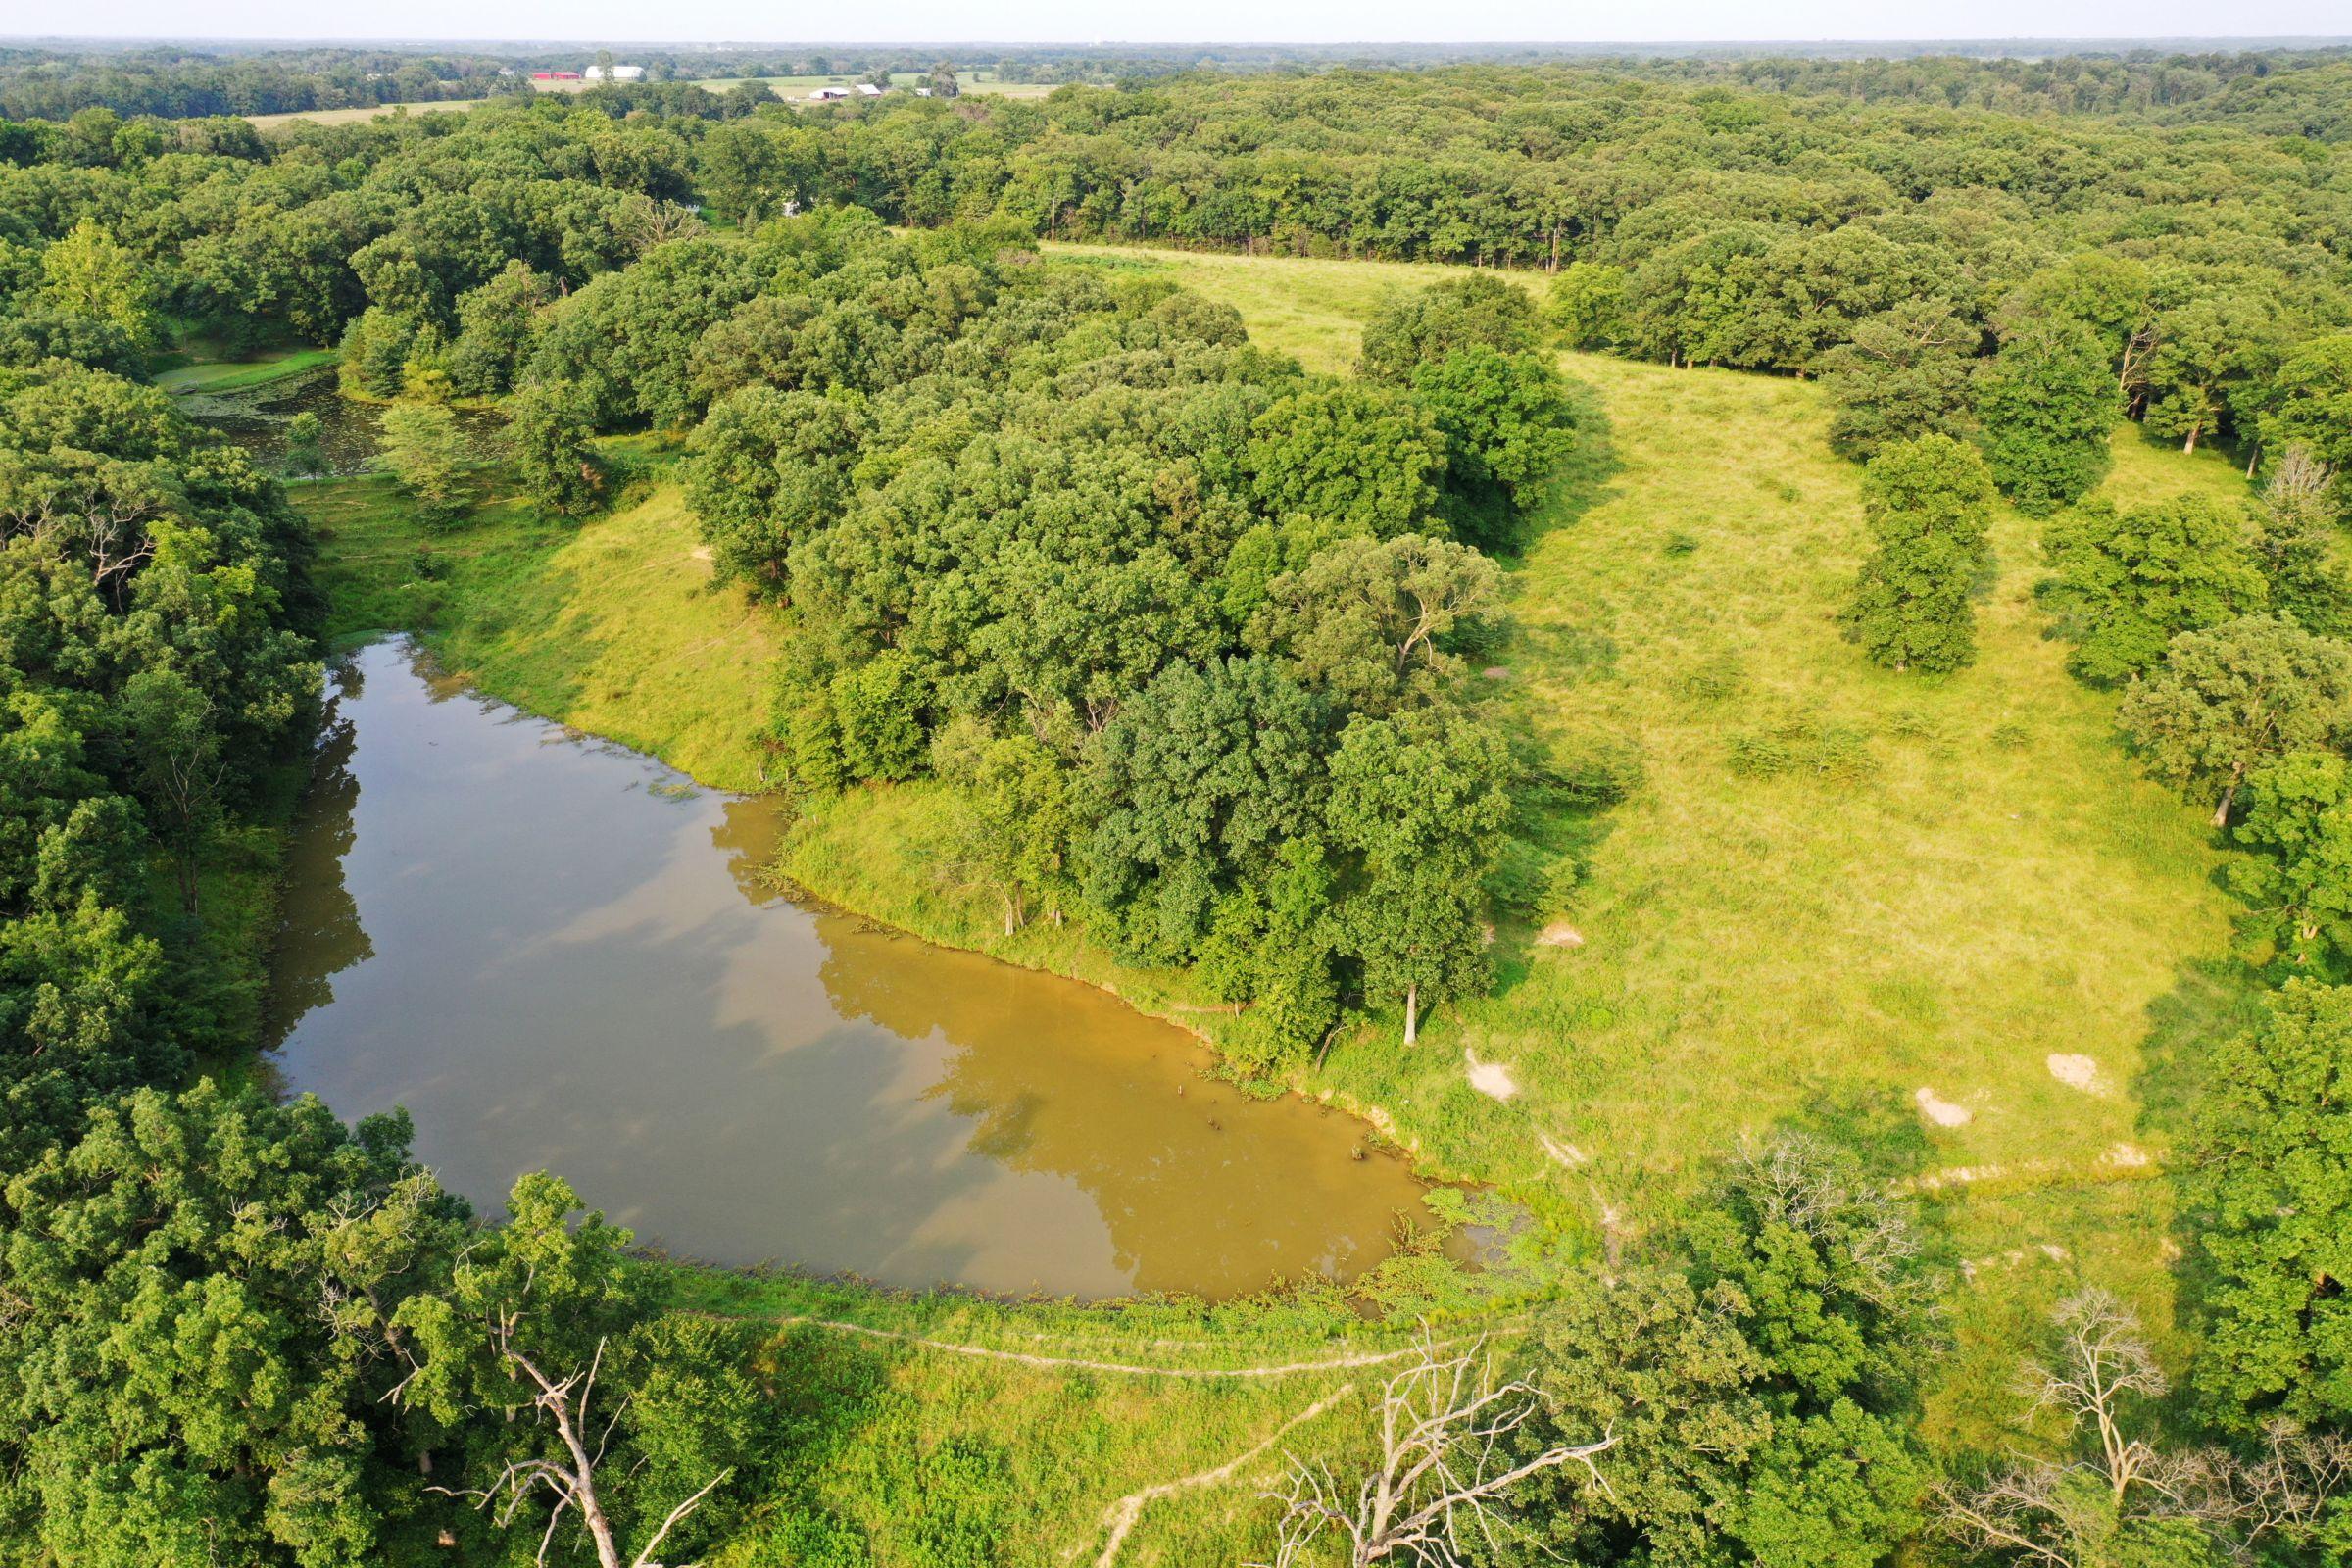 land-lee-county-iowa-340-acres-listing-number-15649-8-2021-07-21-185547.jpg